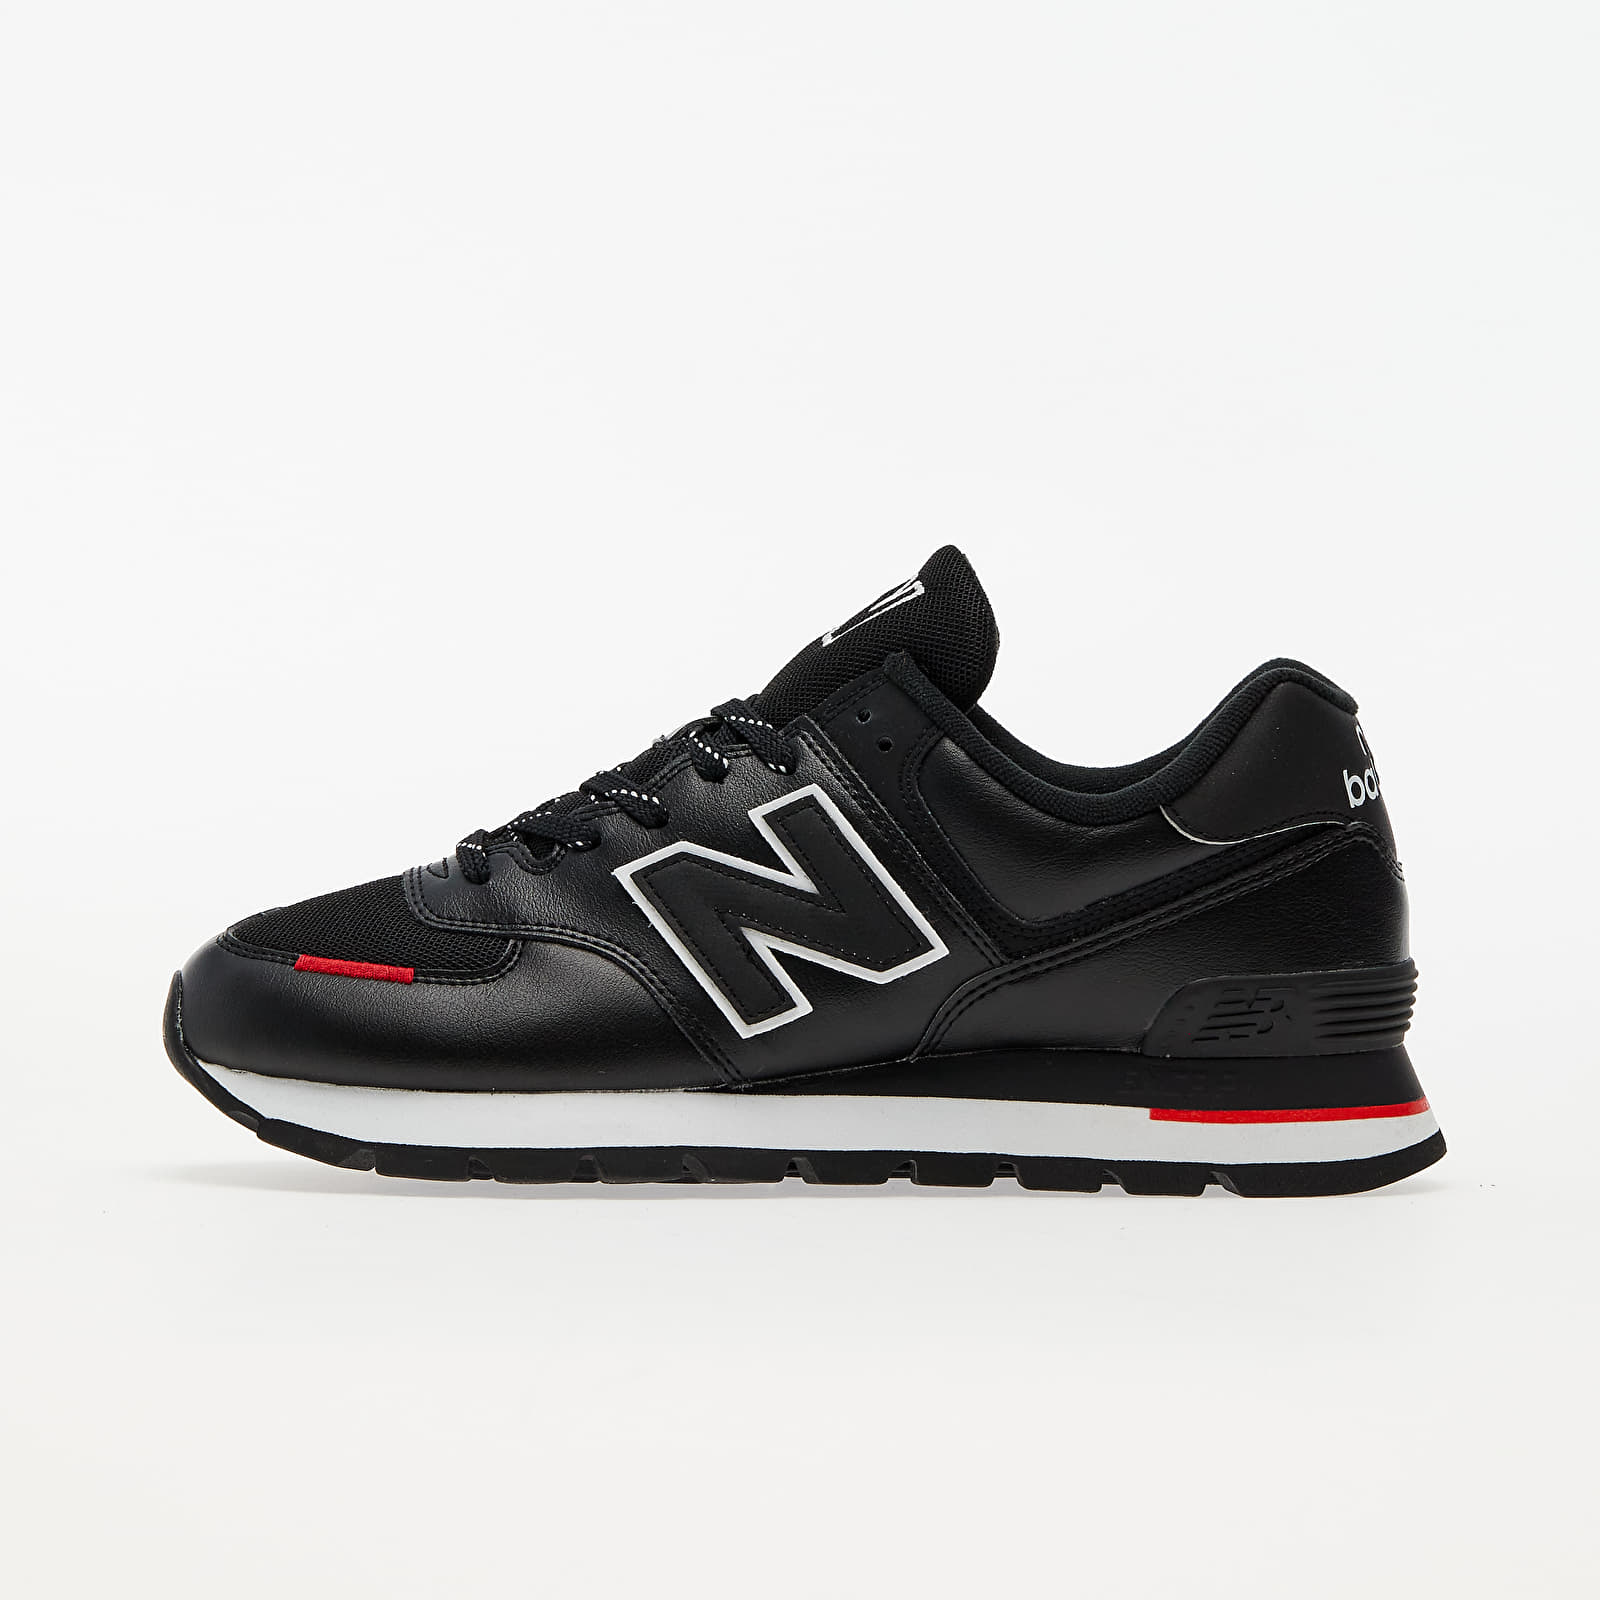 New Balance 574 Black/ Red EUR 43